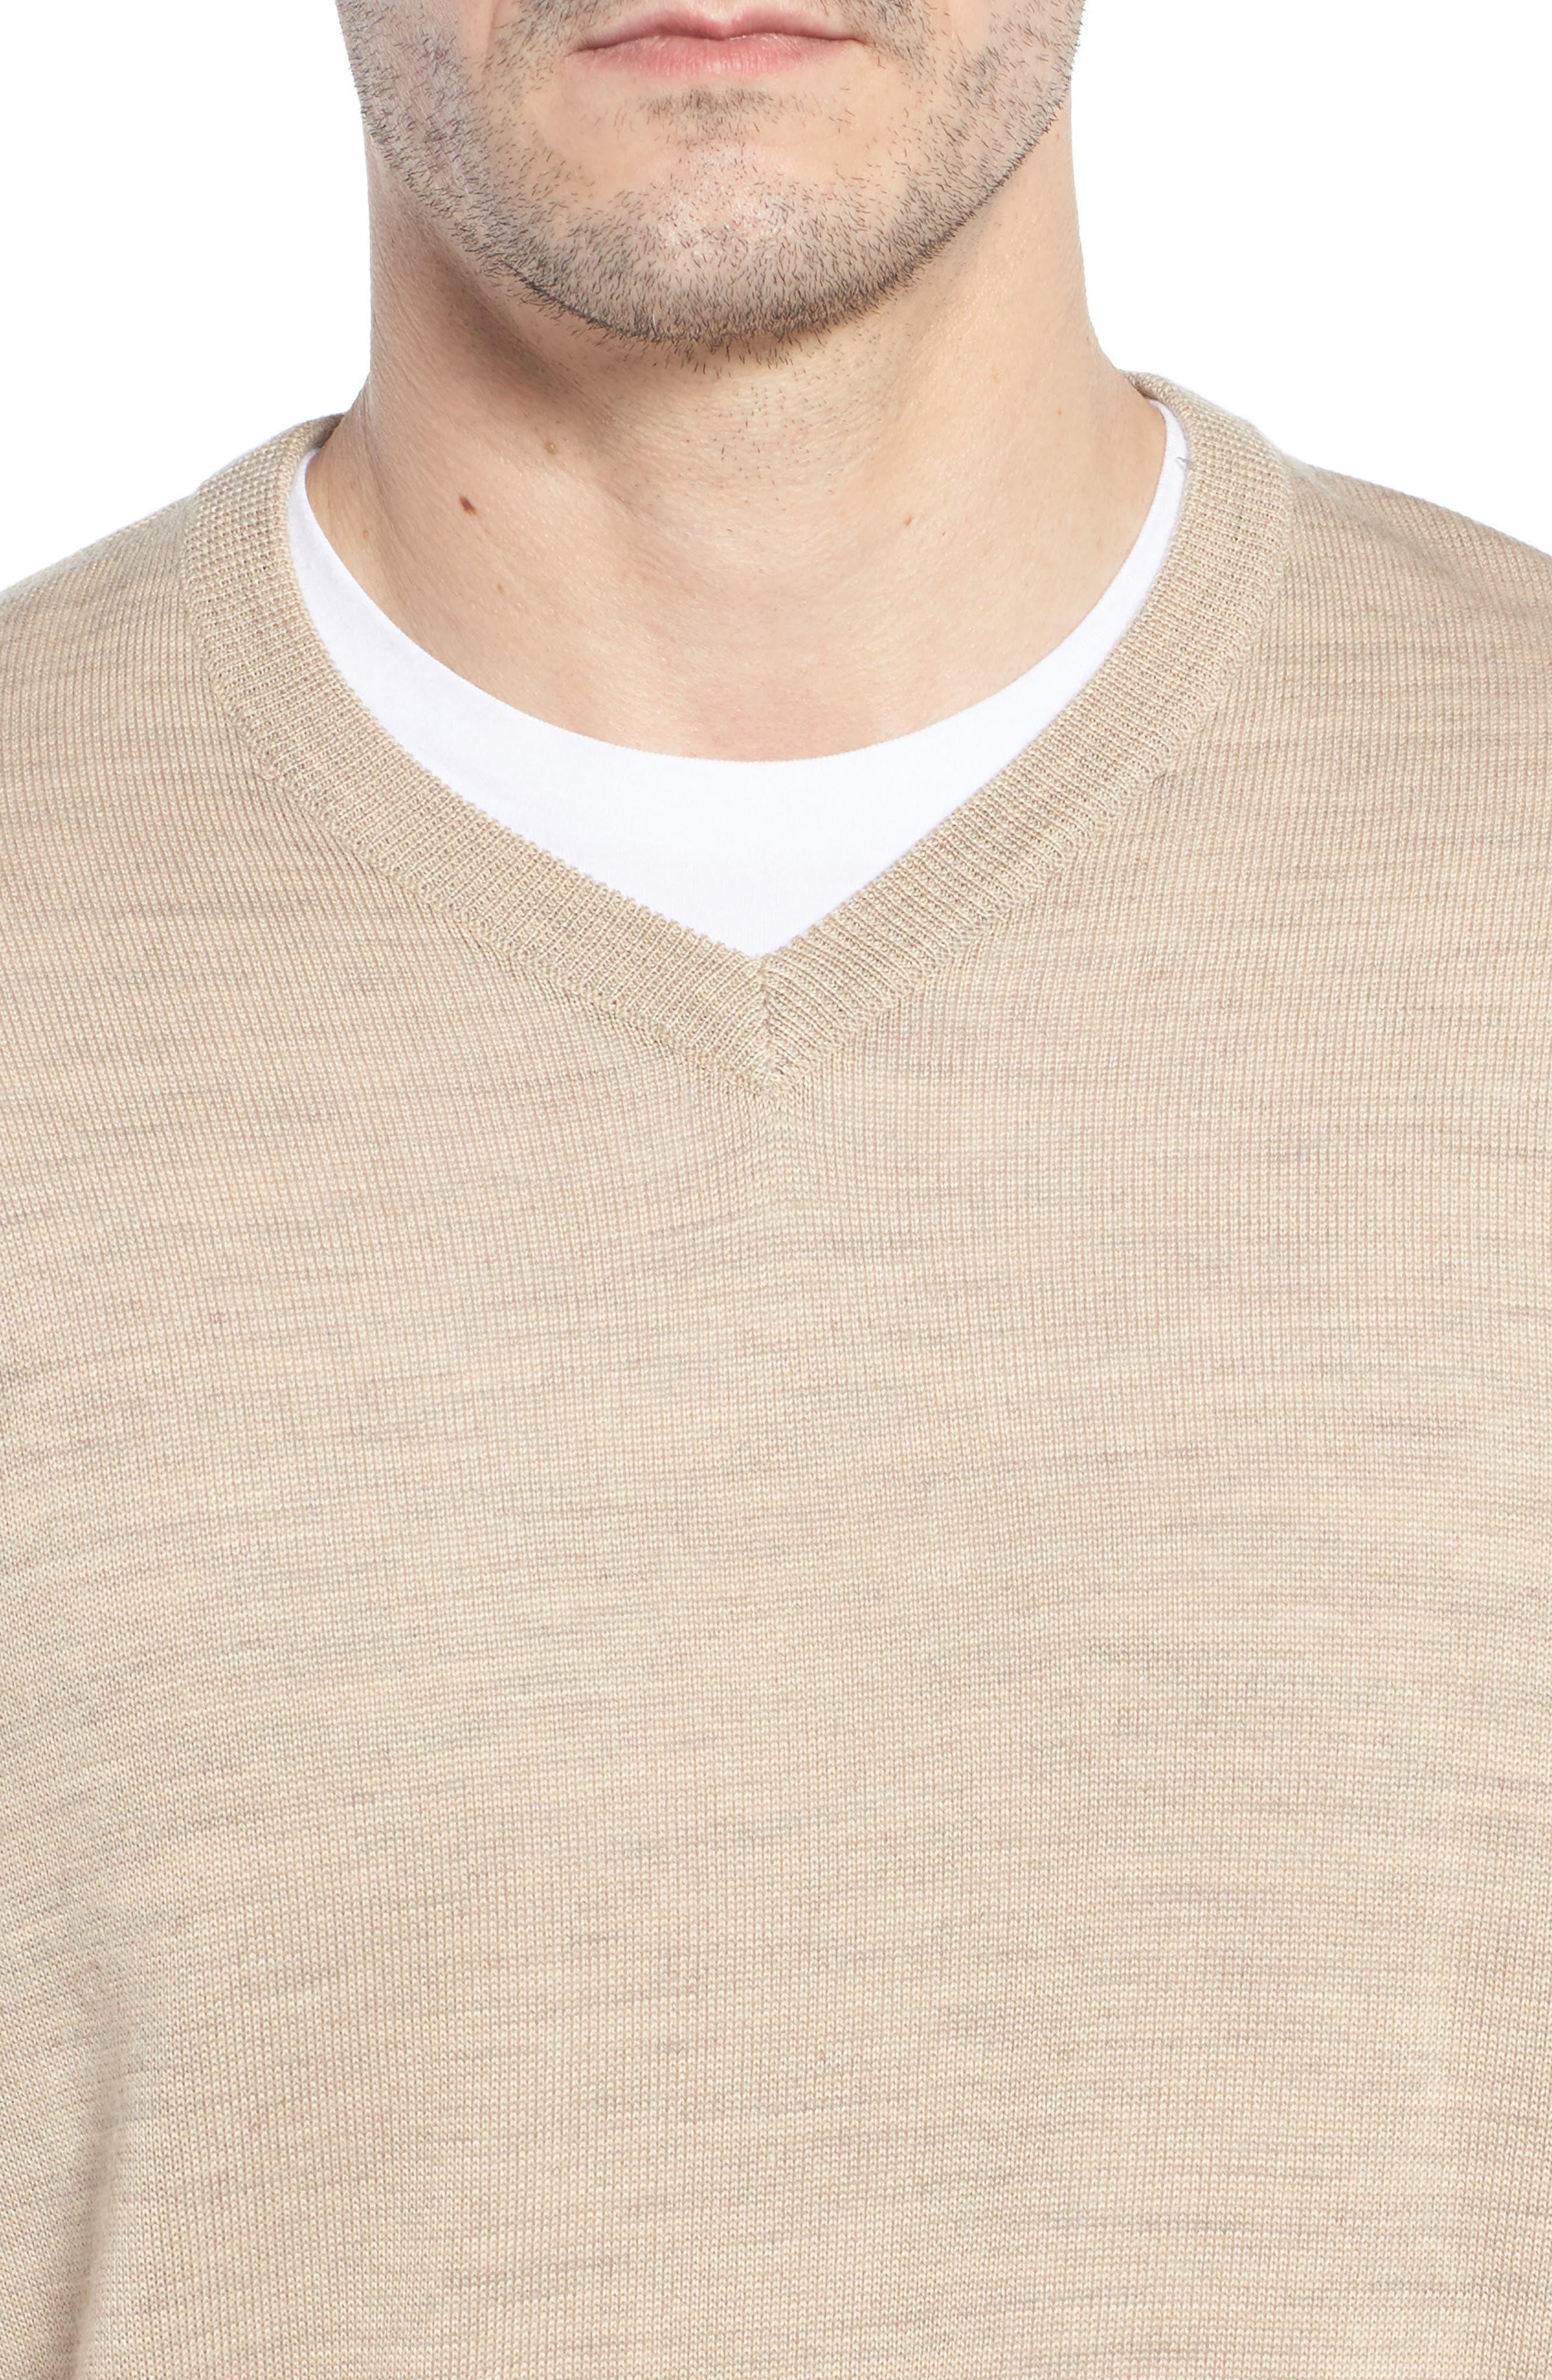 CUTTER & BUCK, 'Douglas' Merino Wool Blend V-Neck Sweater, Alternate thumbnail 4, color, SAND HEATHER